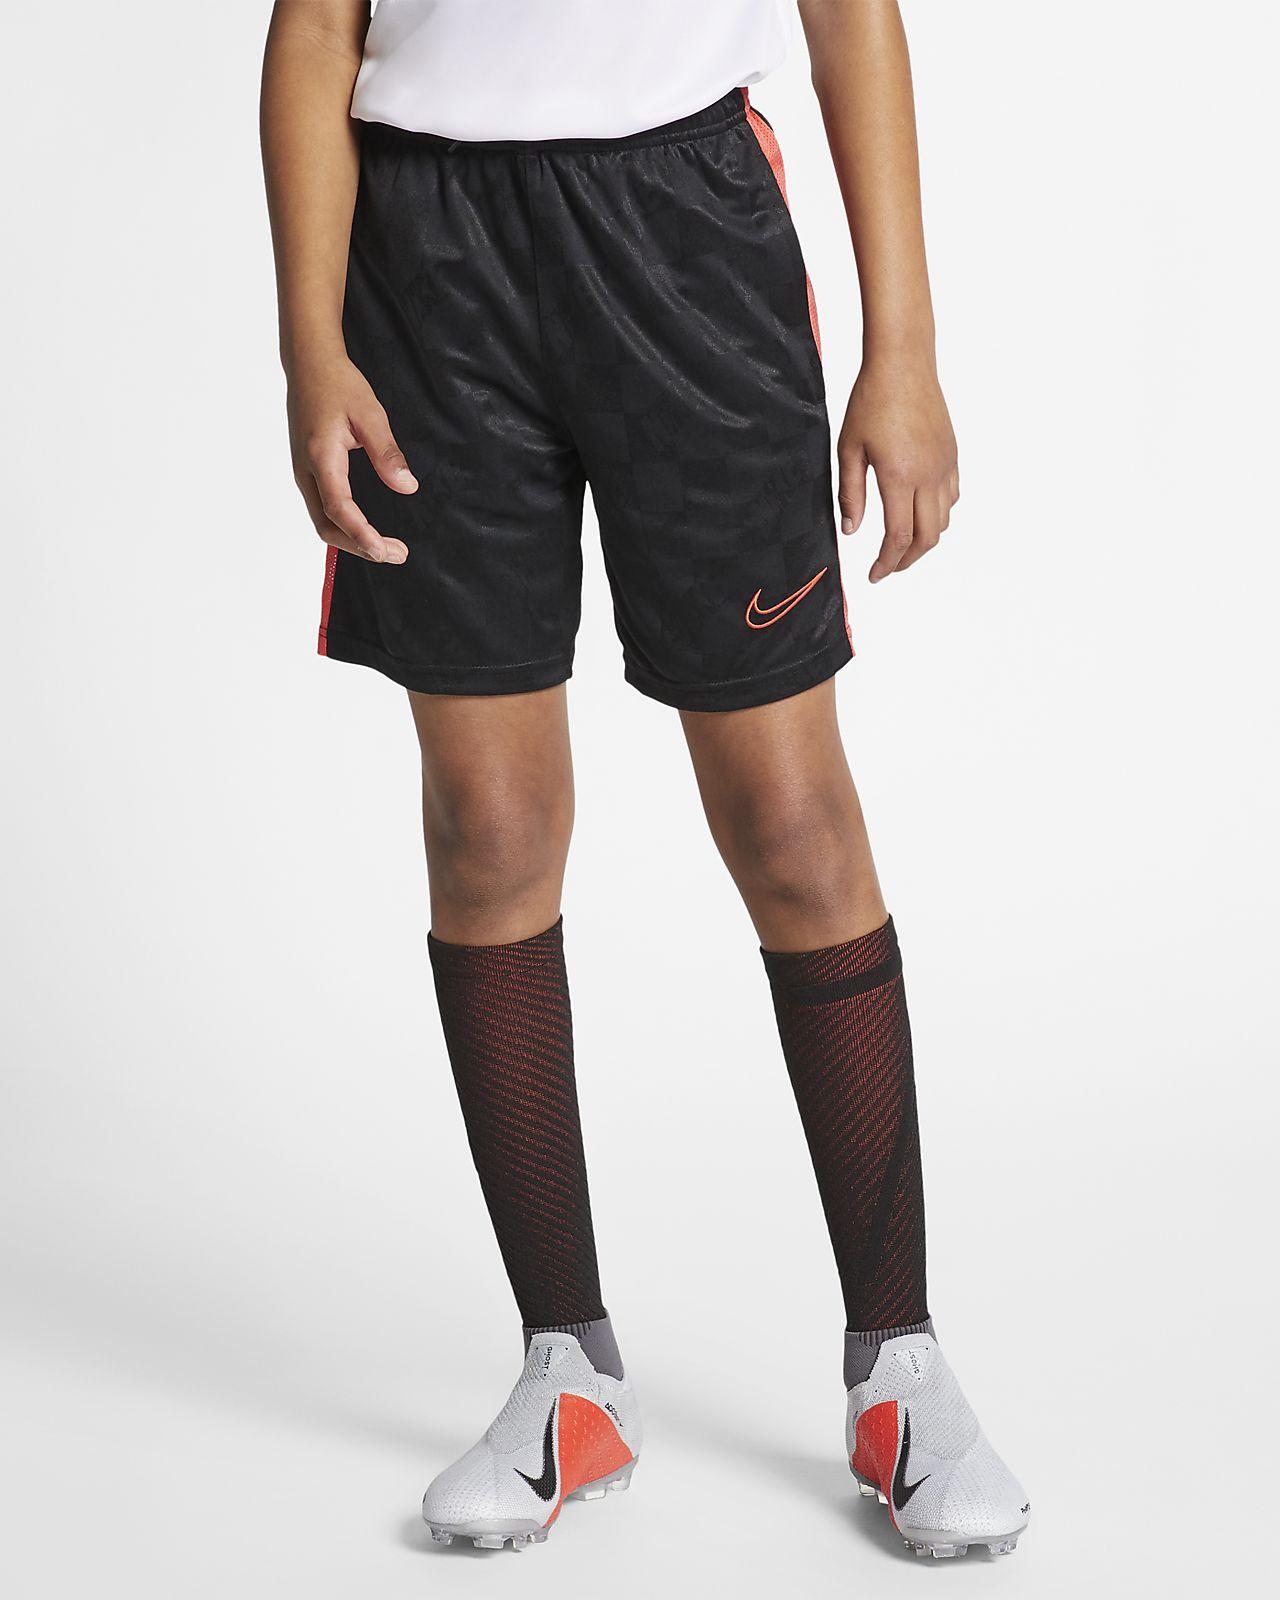 Nike Breathe Academy Fußballshorts für ältere Kinder